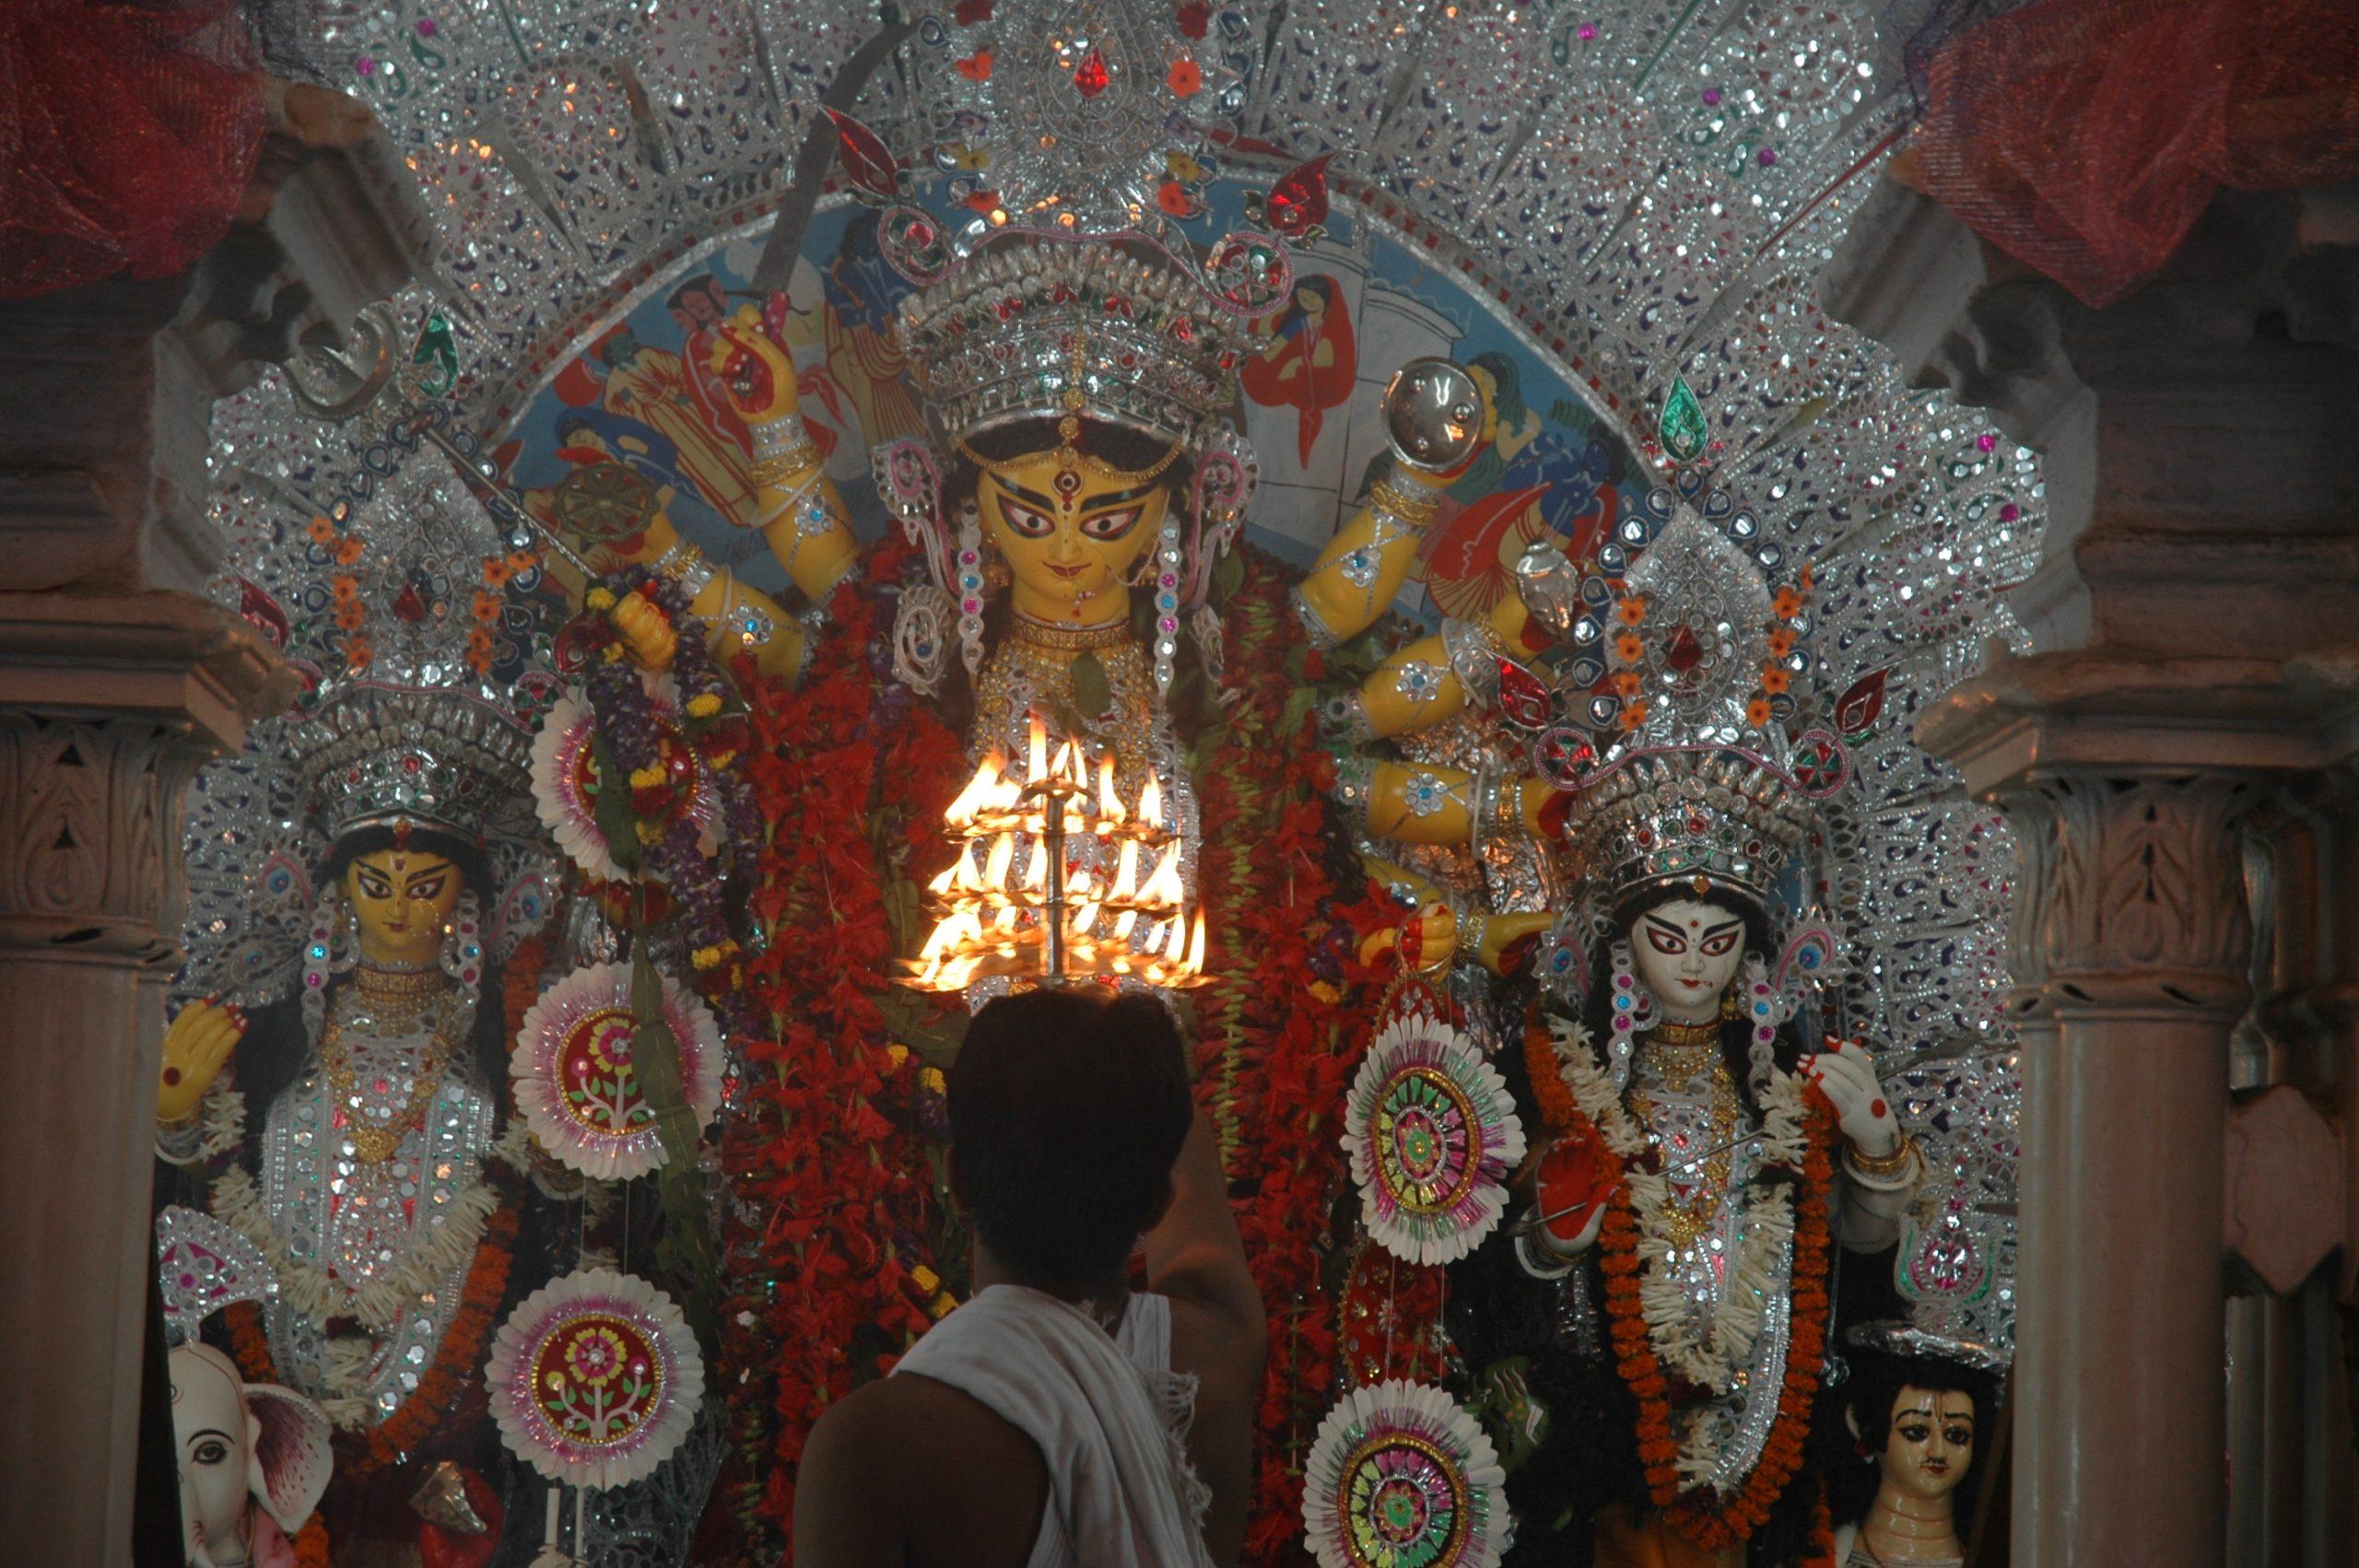 Durga Puja 2020 Dates & Time,Durga Puja Nirghanta 2020 (১৪২৭) in Bangla, Bengali Durga Puja Calendar 2020 (১৪২৭)